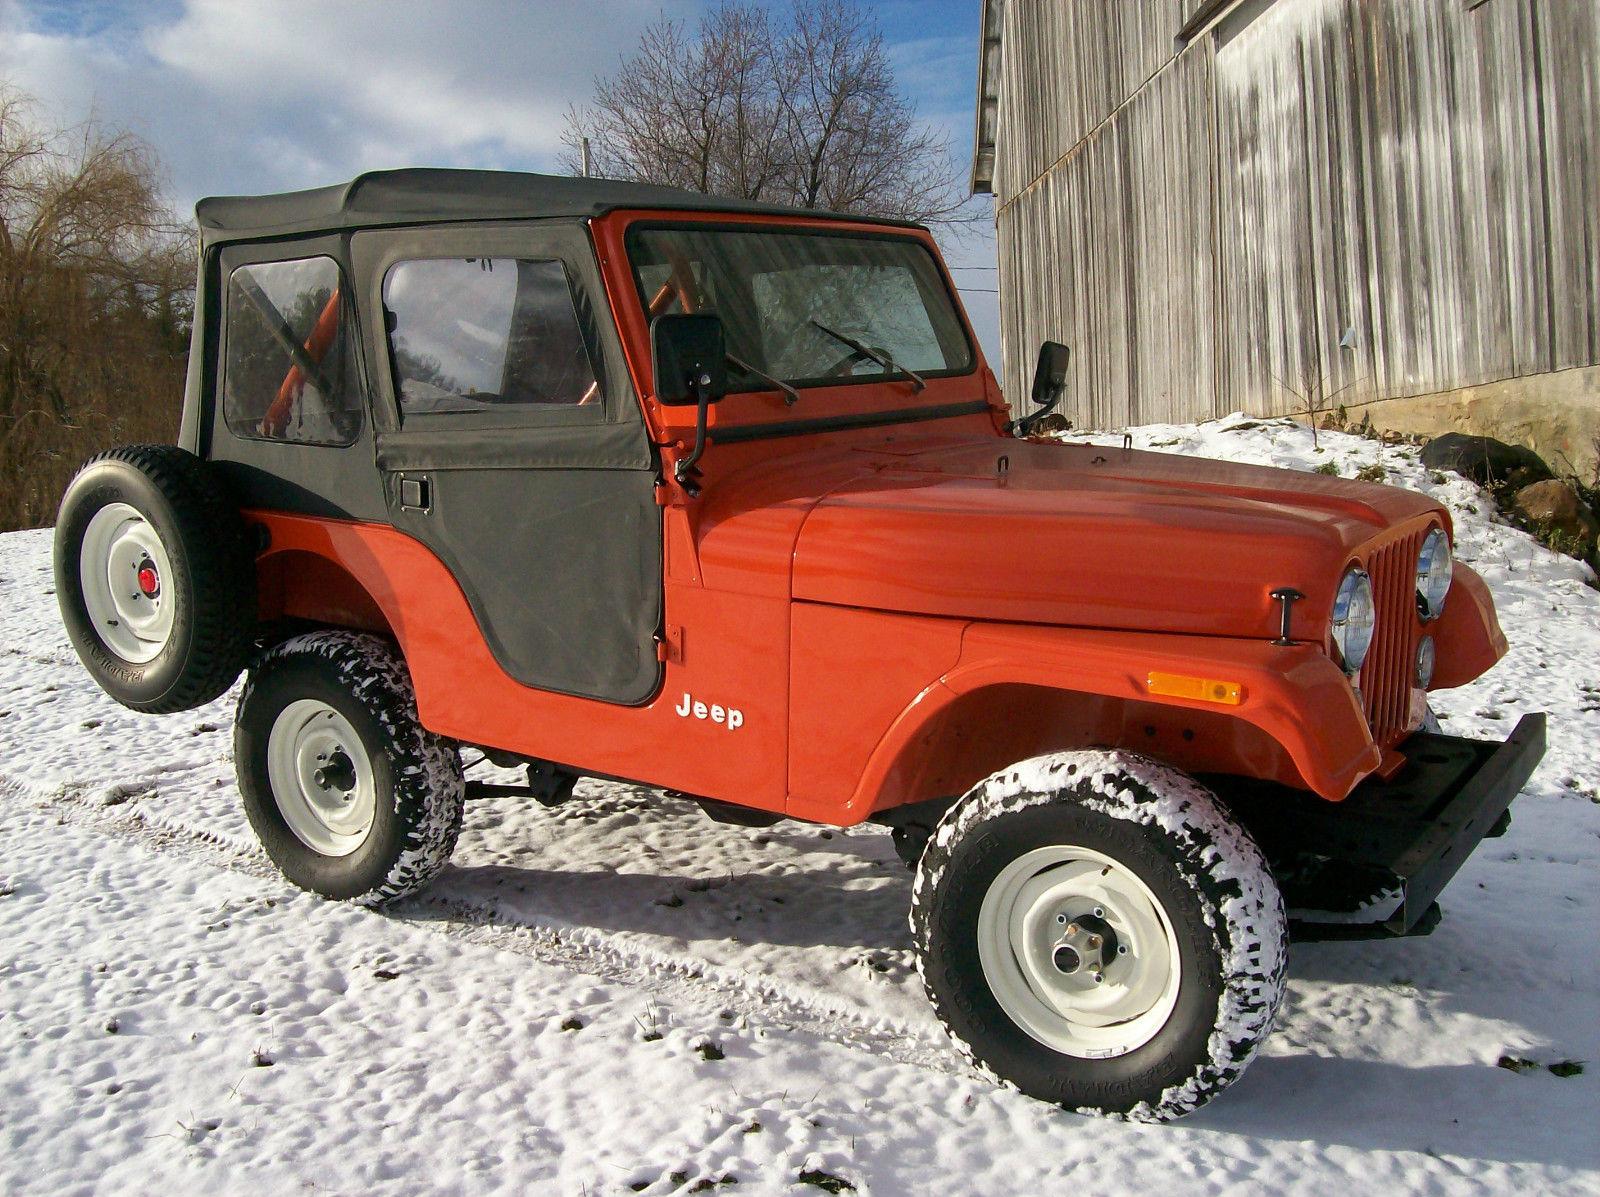 1981 Jeep Cj5 Low Mileage Clean Survivor Must See